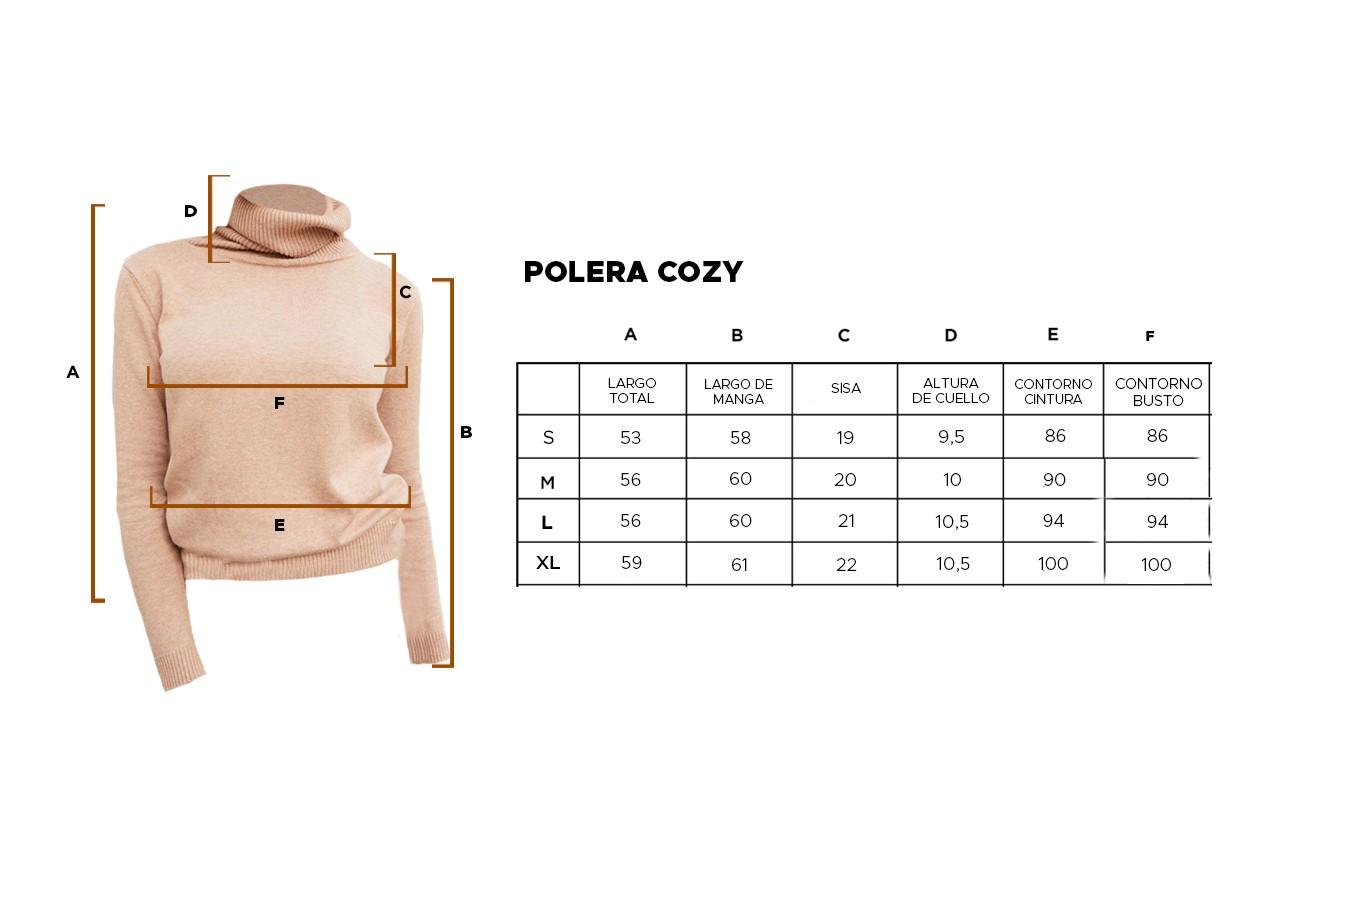 POLERA COZY